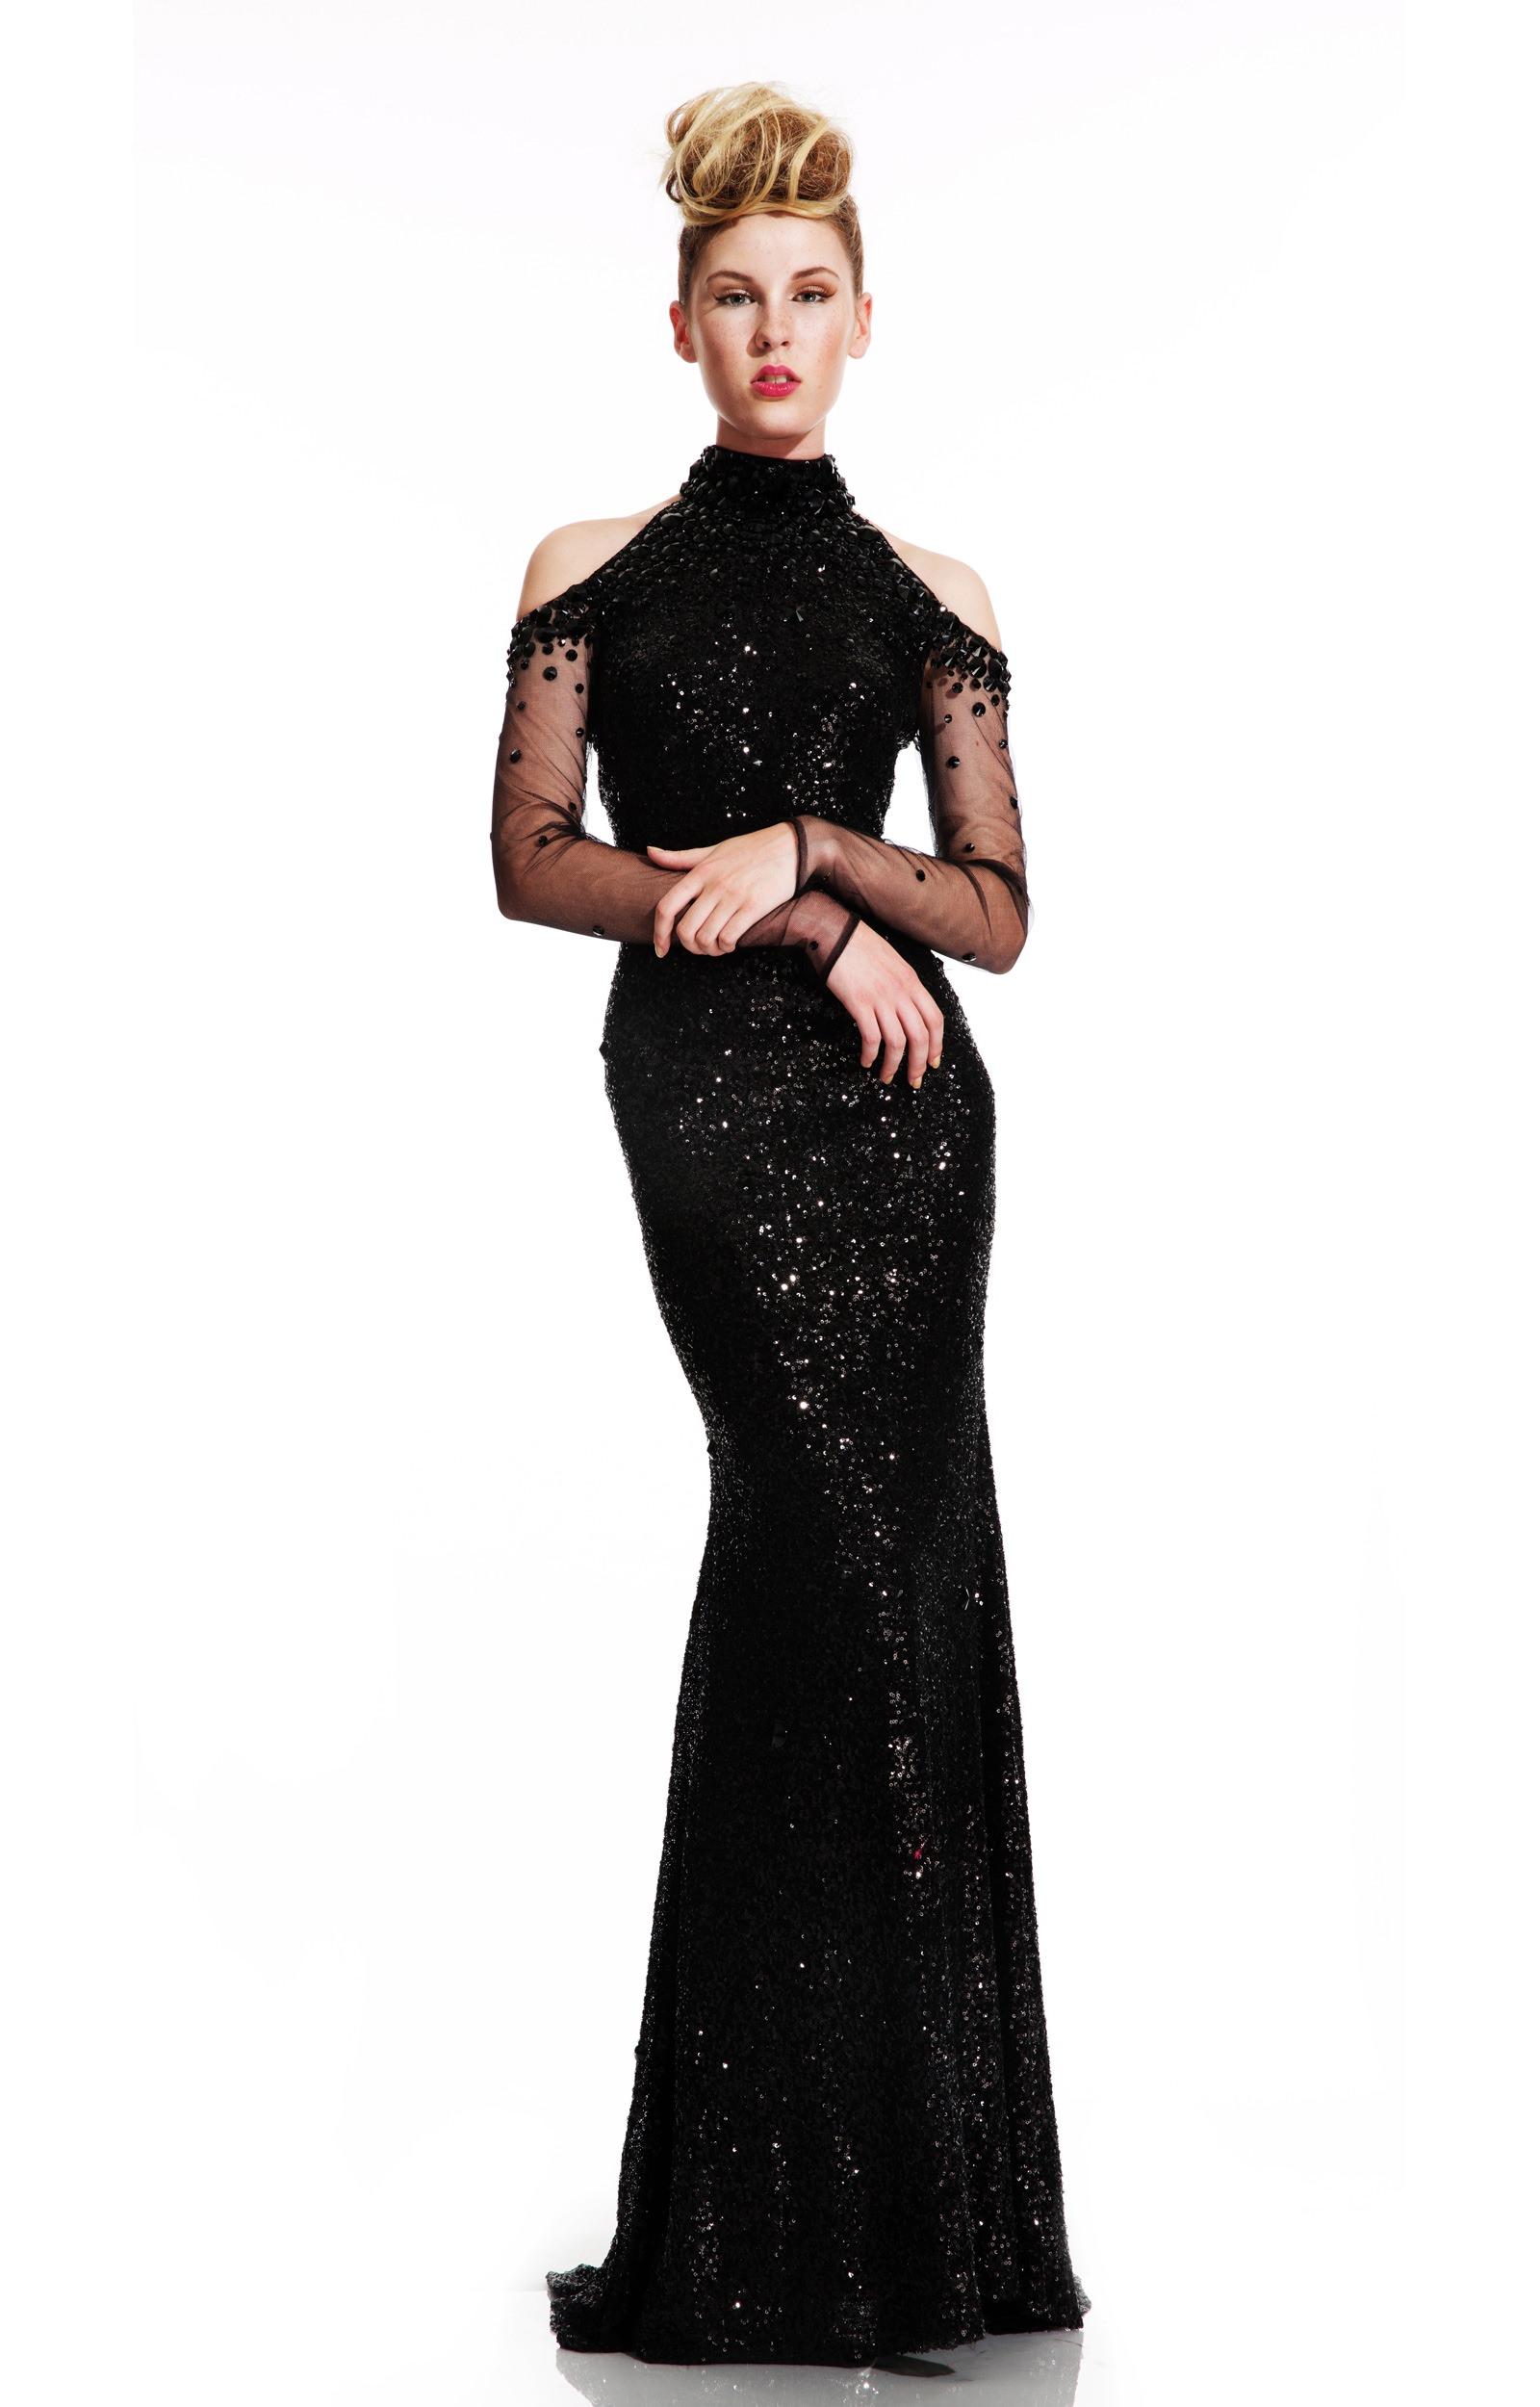 Orange Chiffon Its Fashion Metro Blouses Dark Brown: The Dark Lady Prom Dress